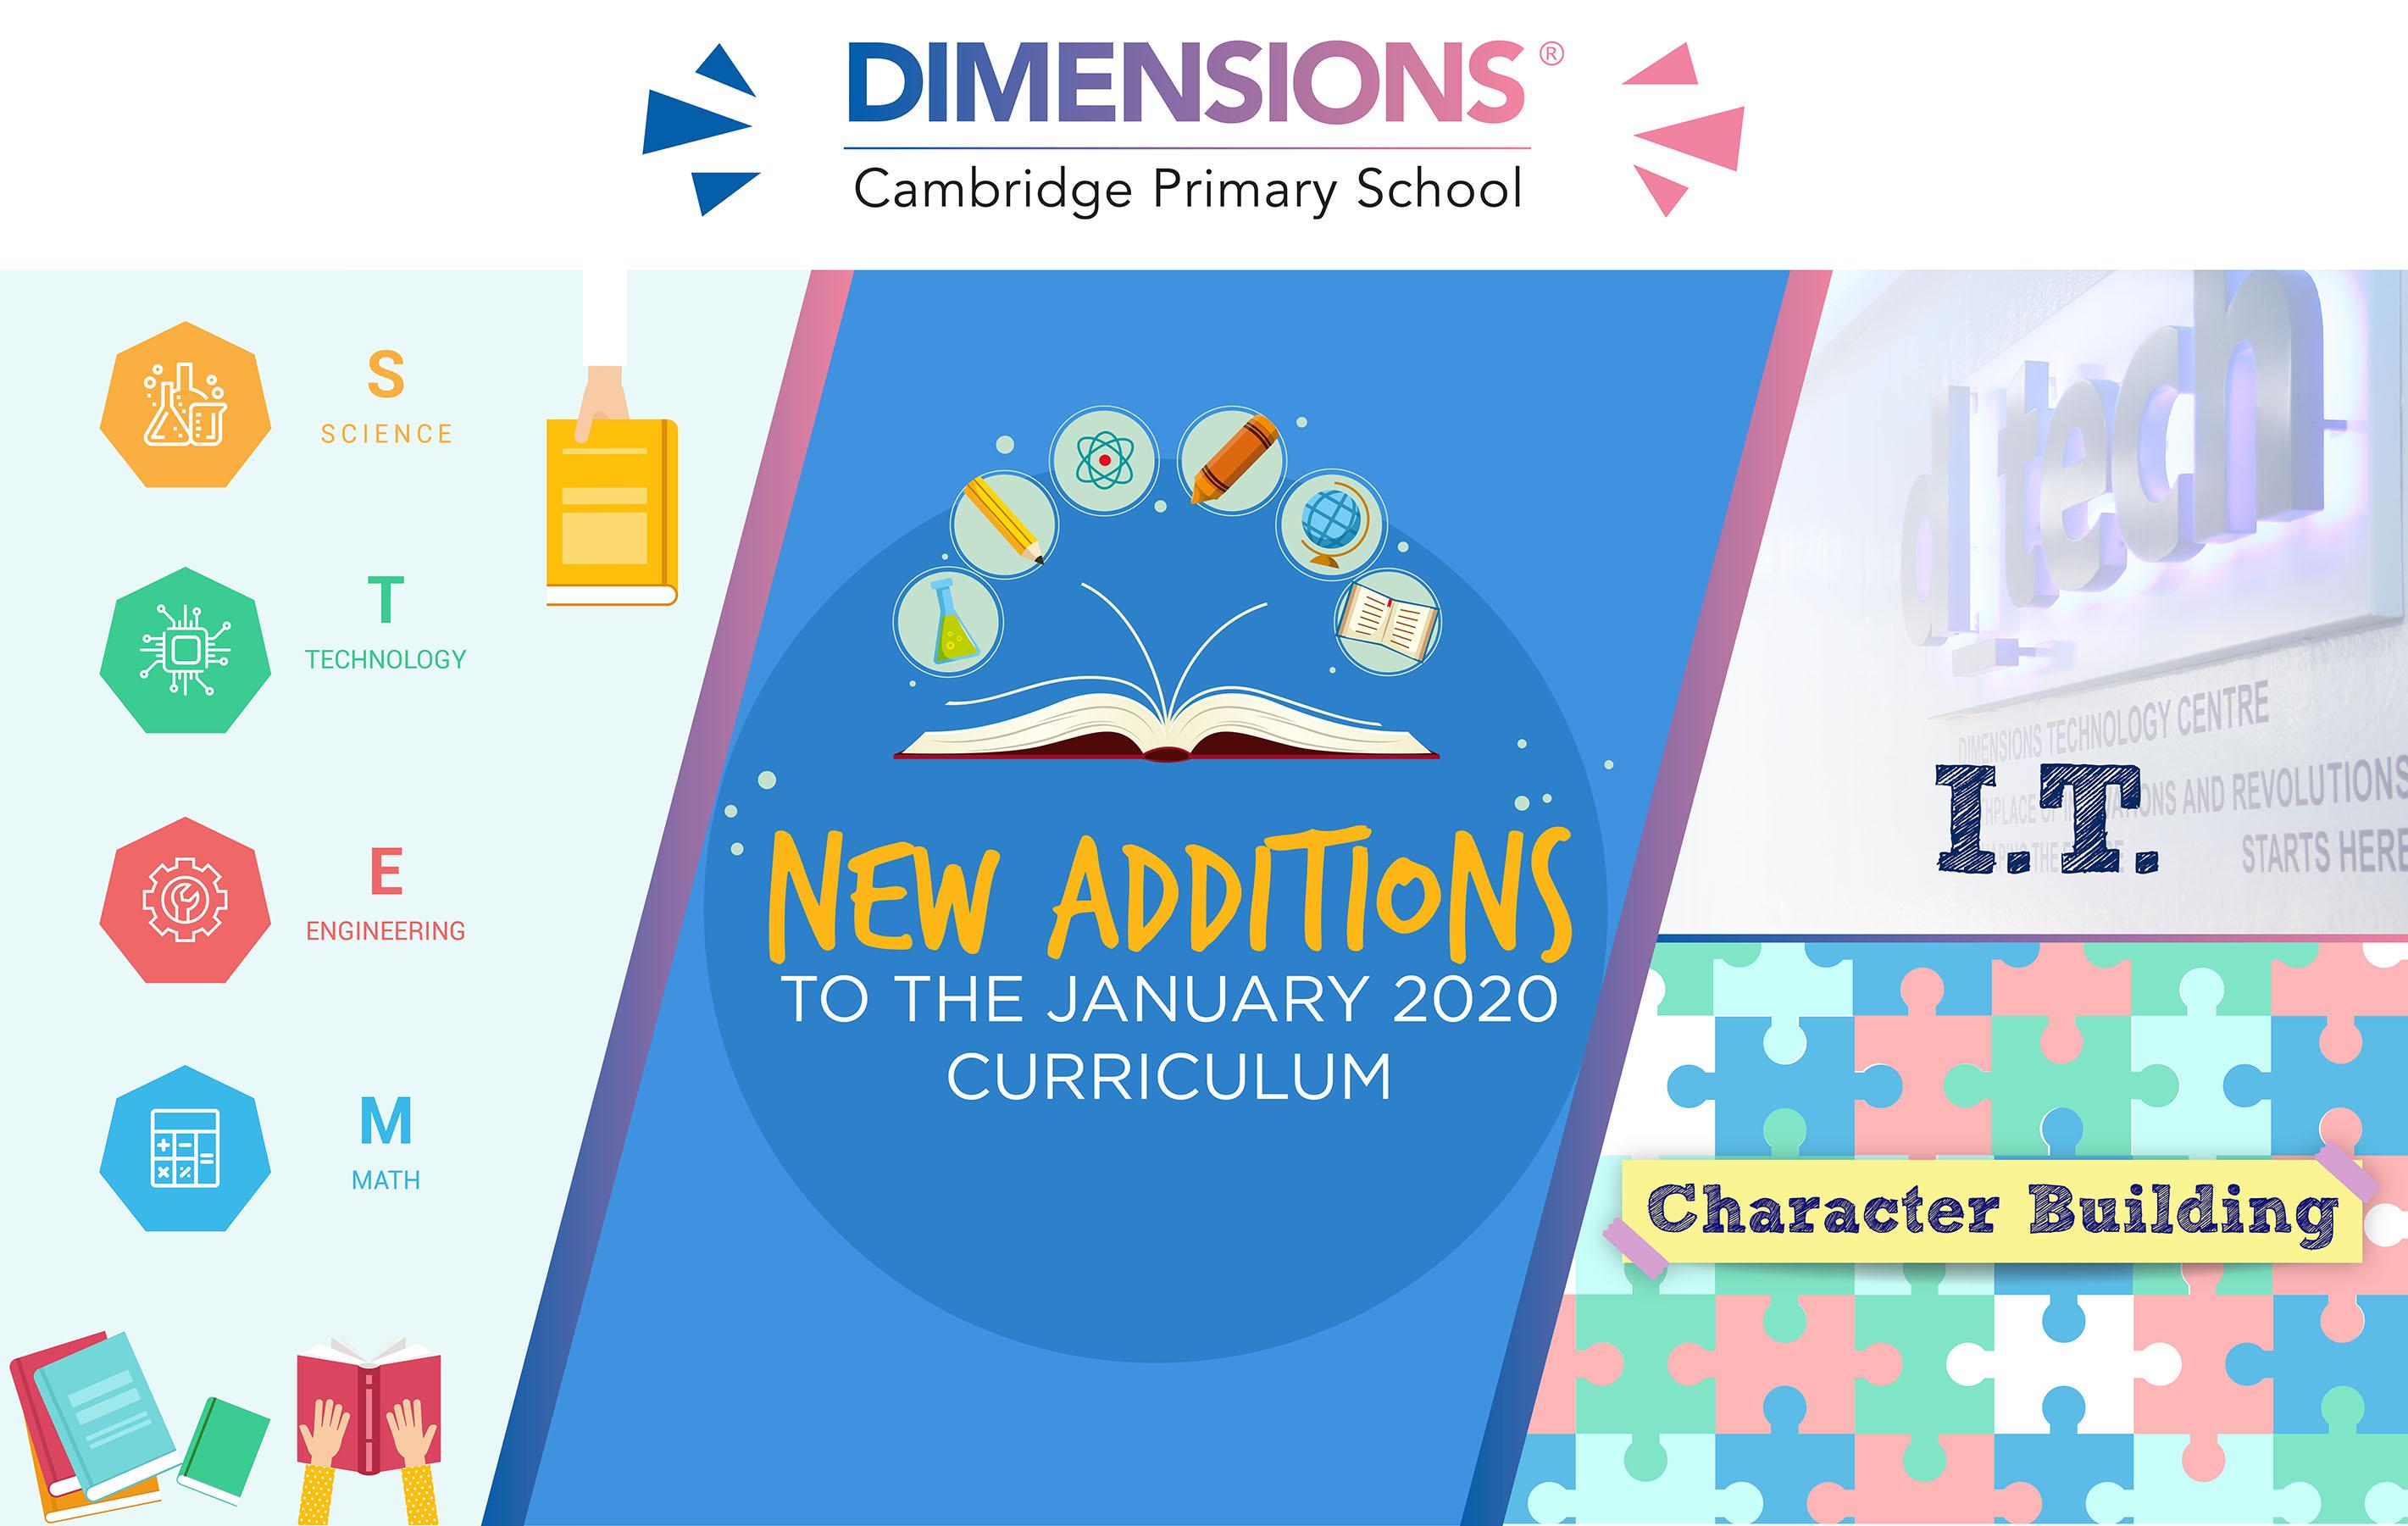 https://dimensions.edu.sg/landing/wp-content/uploads/2019/10/Dimensions-Cambridge-Primary-Education.jpg